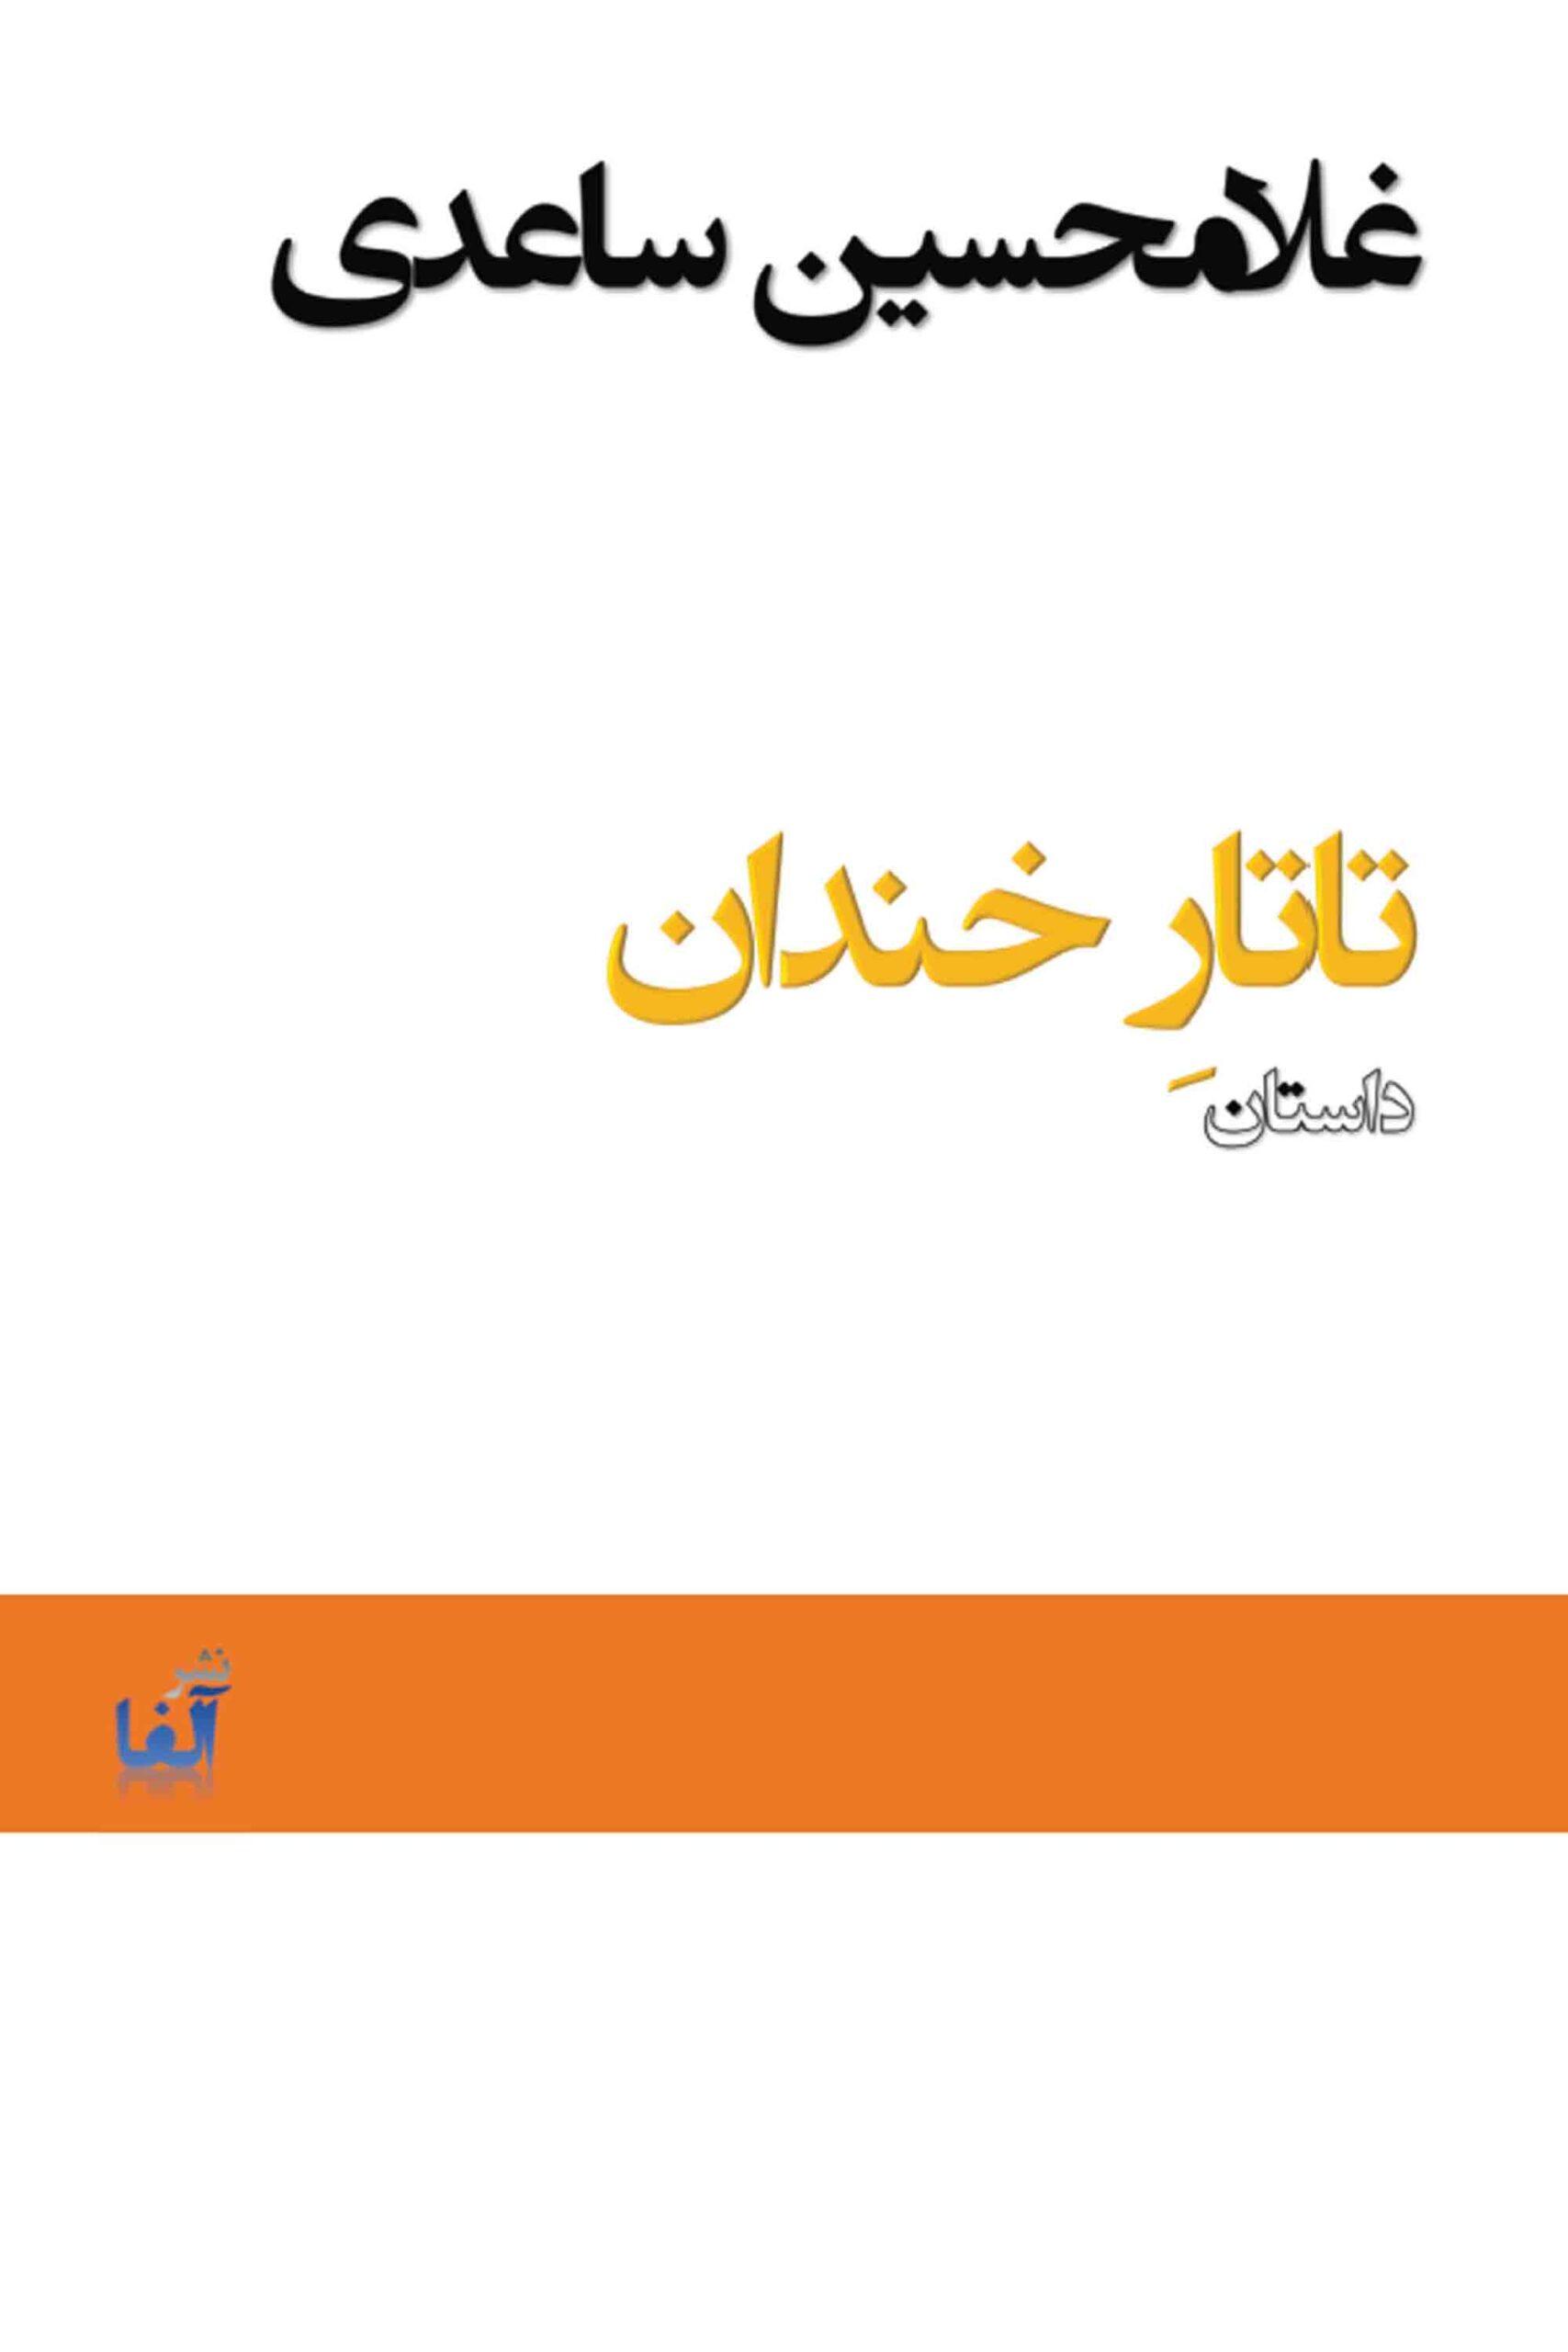 tatare khandan (The grinning Tartar)